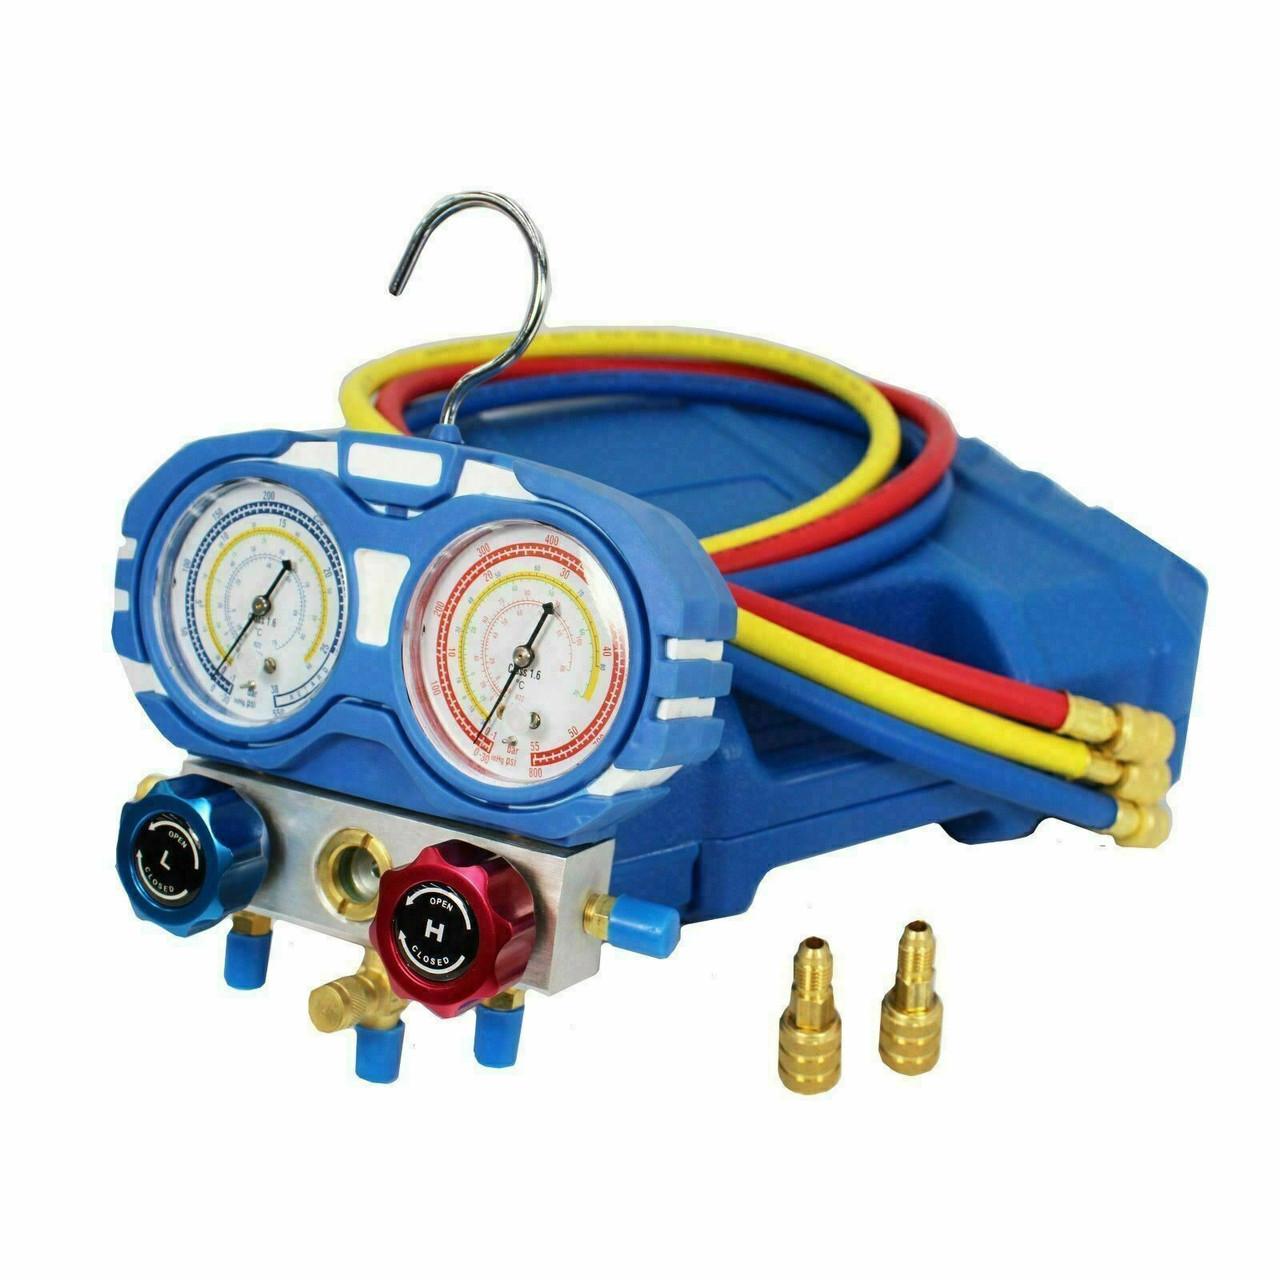 R32 Compliant Non Sparking Vacuum Pump, Leak Detector and Manifold Gauge set